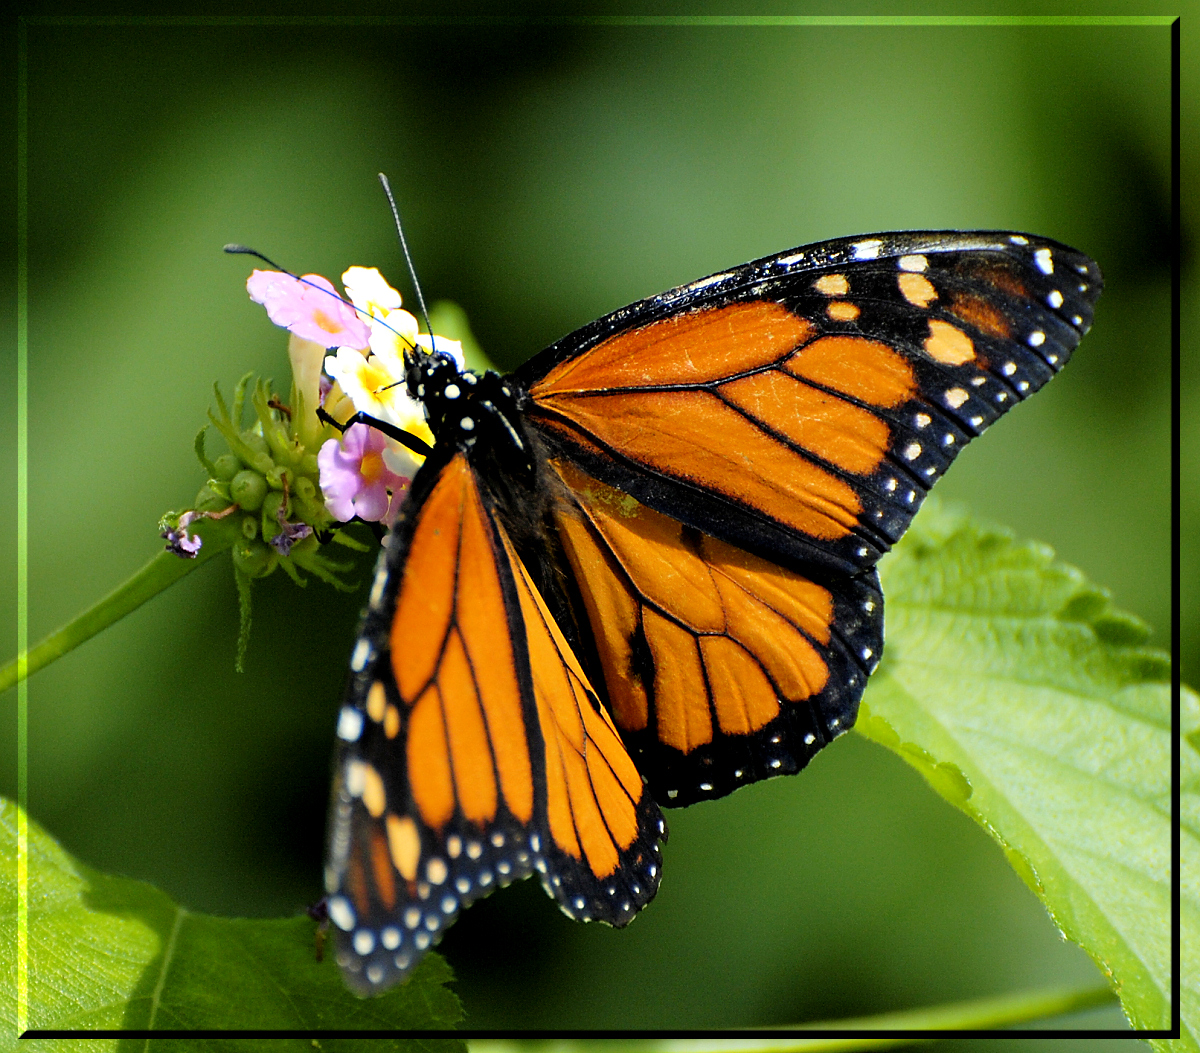 File:Fmc.nikon.d40 - Butterflie (by-sa).jpg - Wikimedia Commons